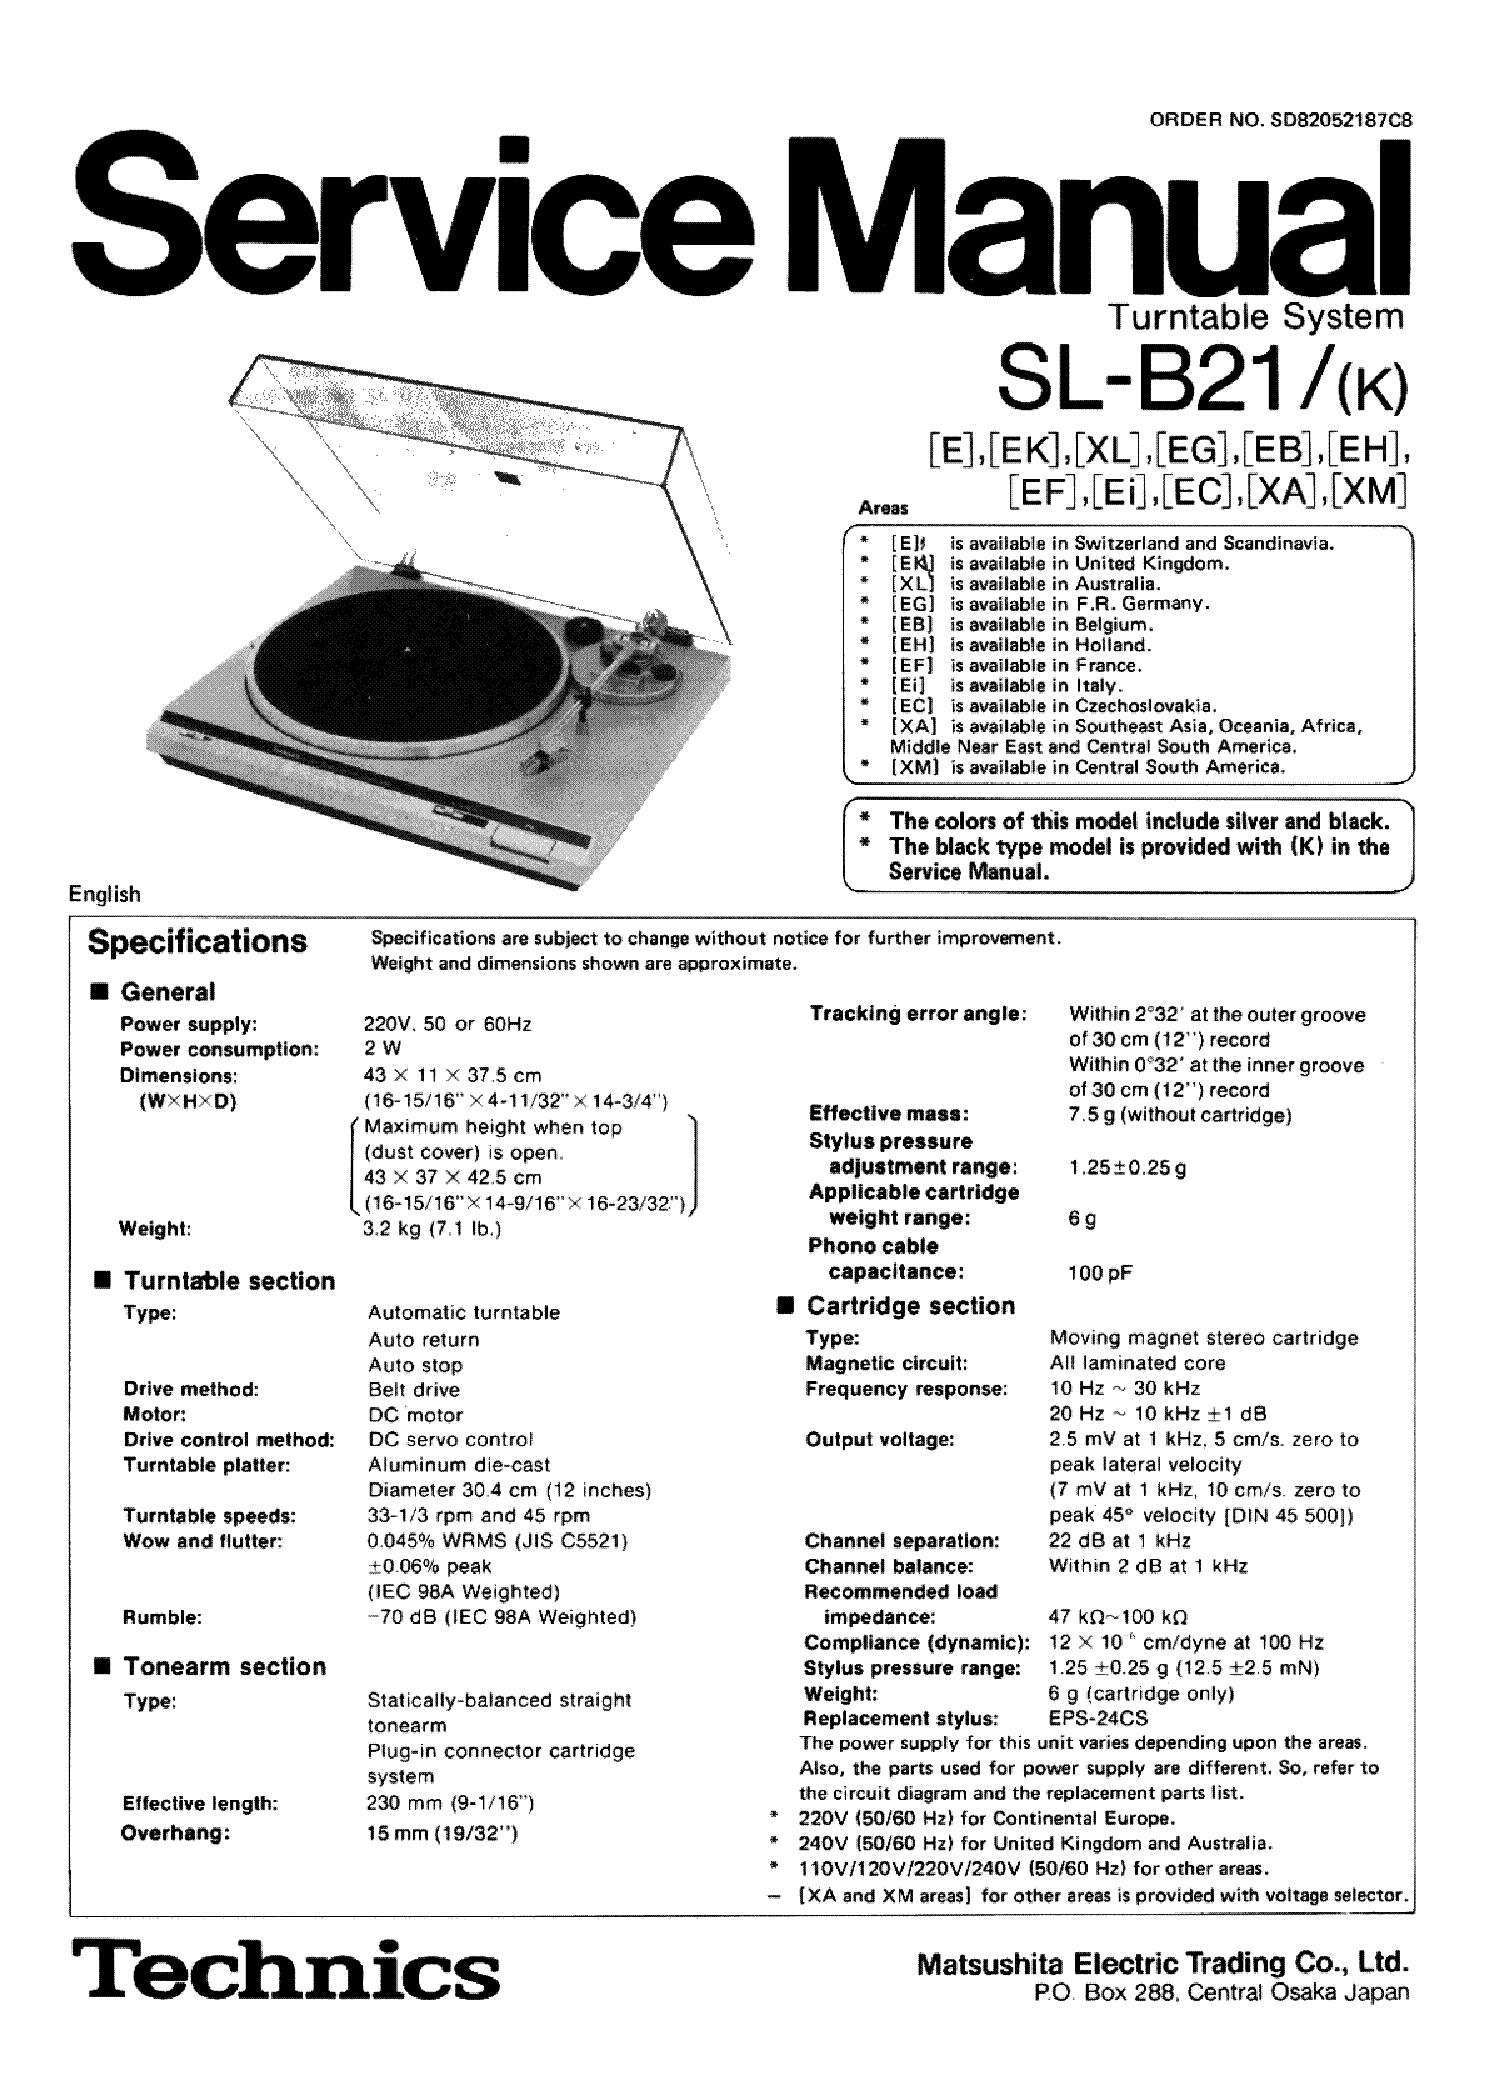 TECHNICS SL-B21 TURNTABLE service manual (1st page)